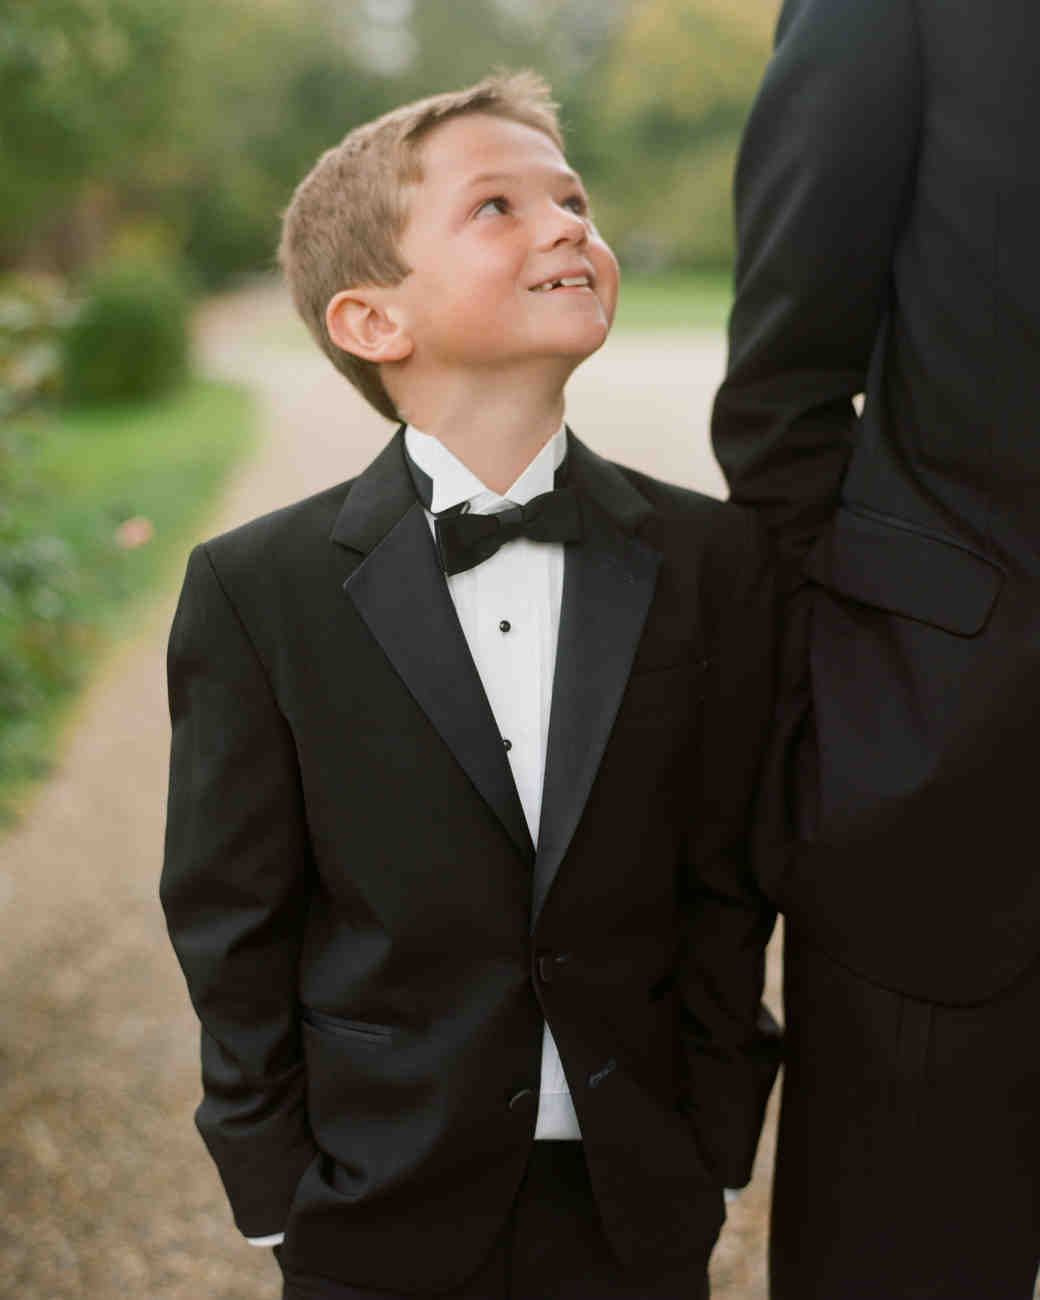 lindsay-garrett-wedding-boy-0718-s111850-0415.jpg